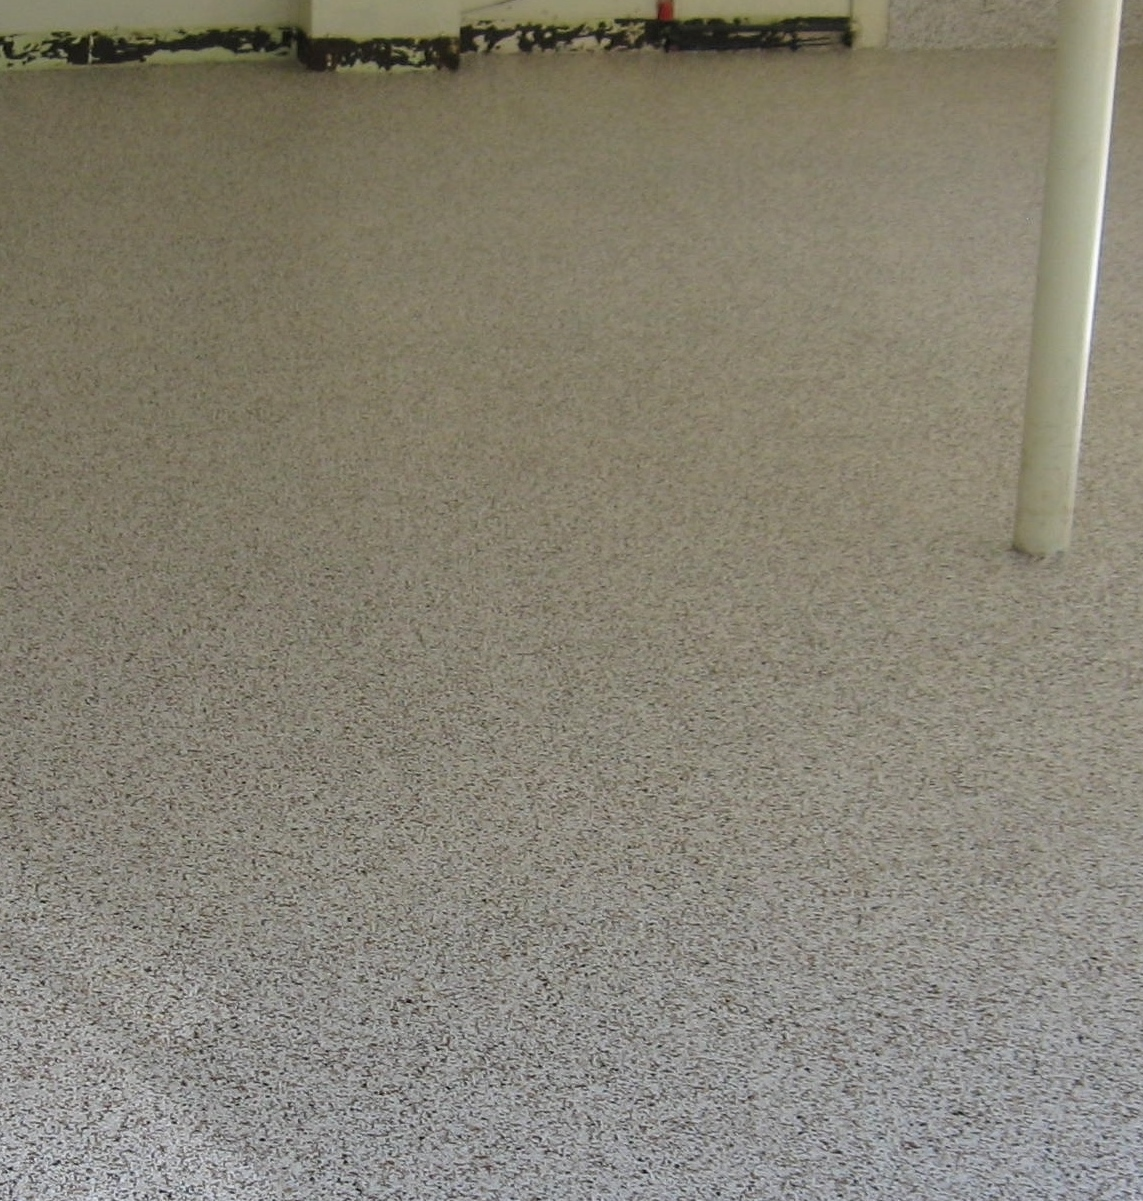 Garage Floor After Picture.